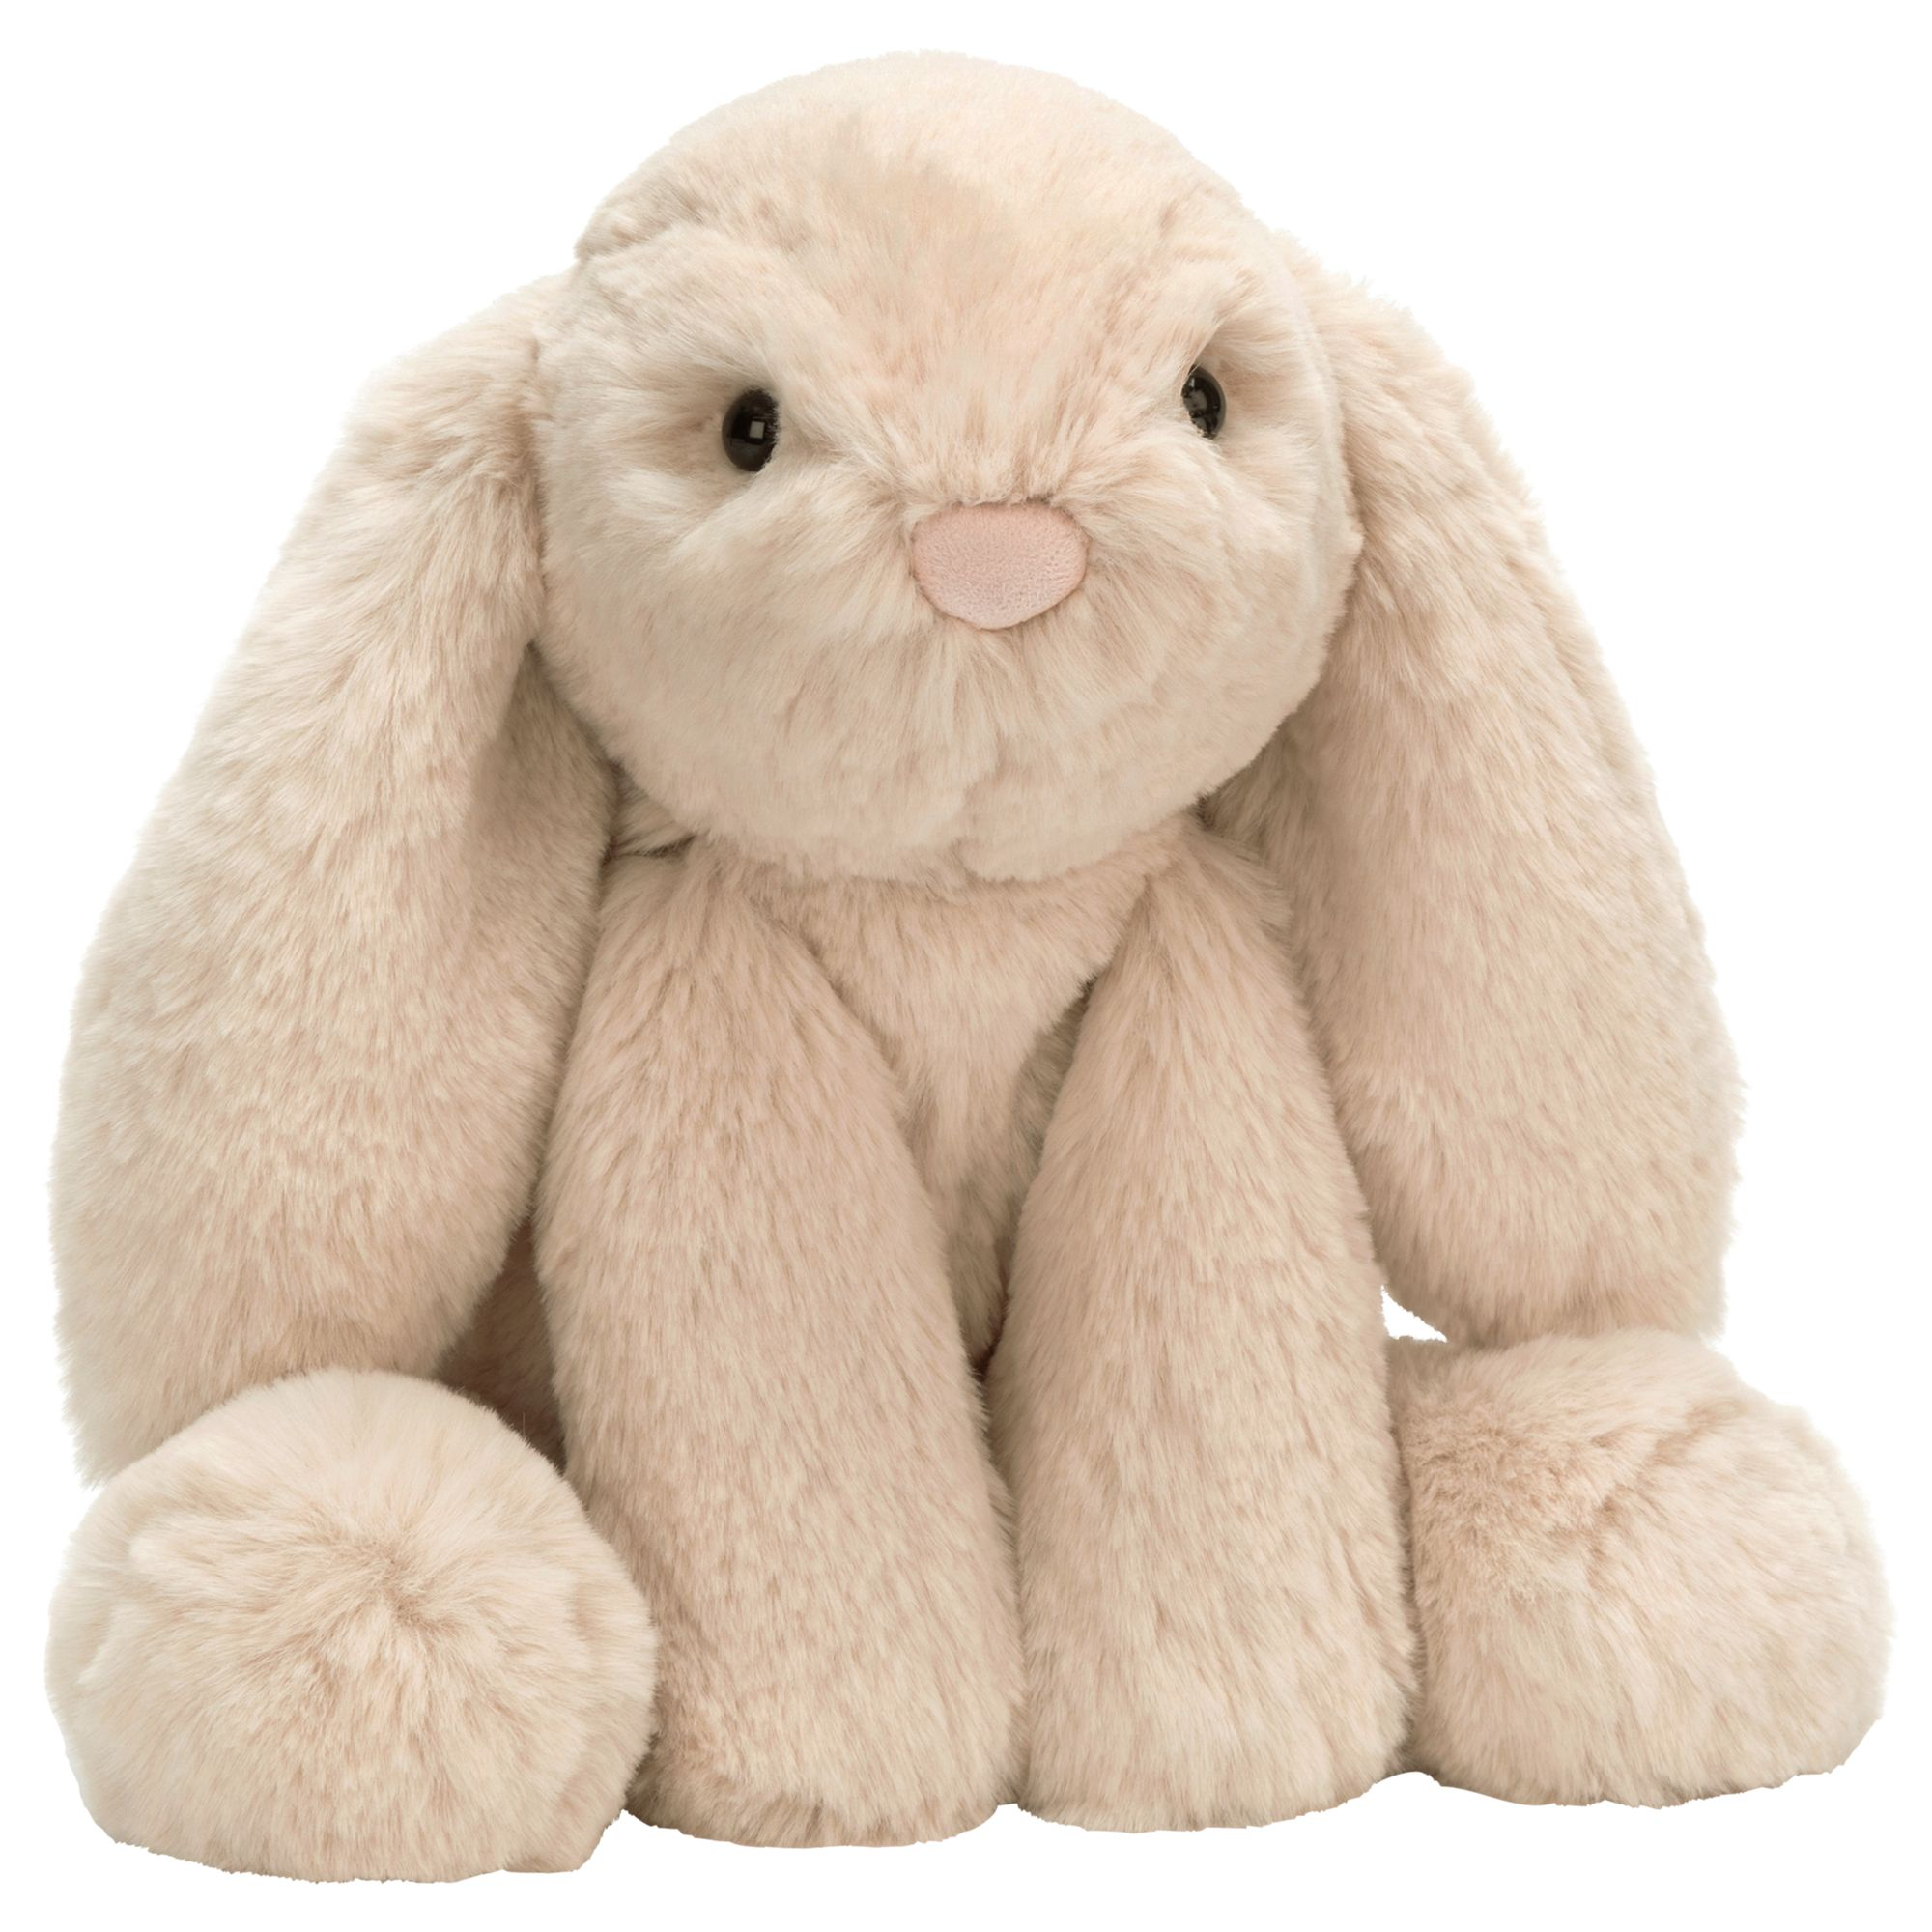 Jellycat Jellycat Smudge Rabbit Soft Toy, Medium